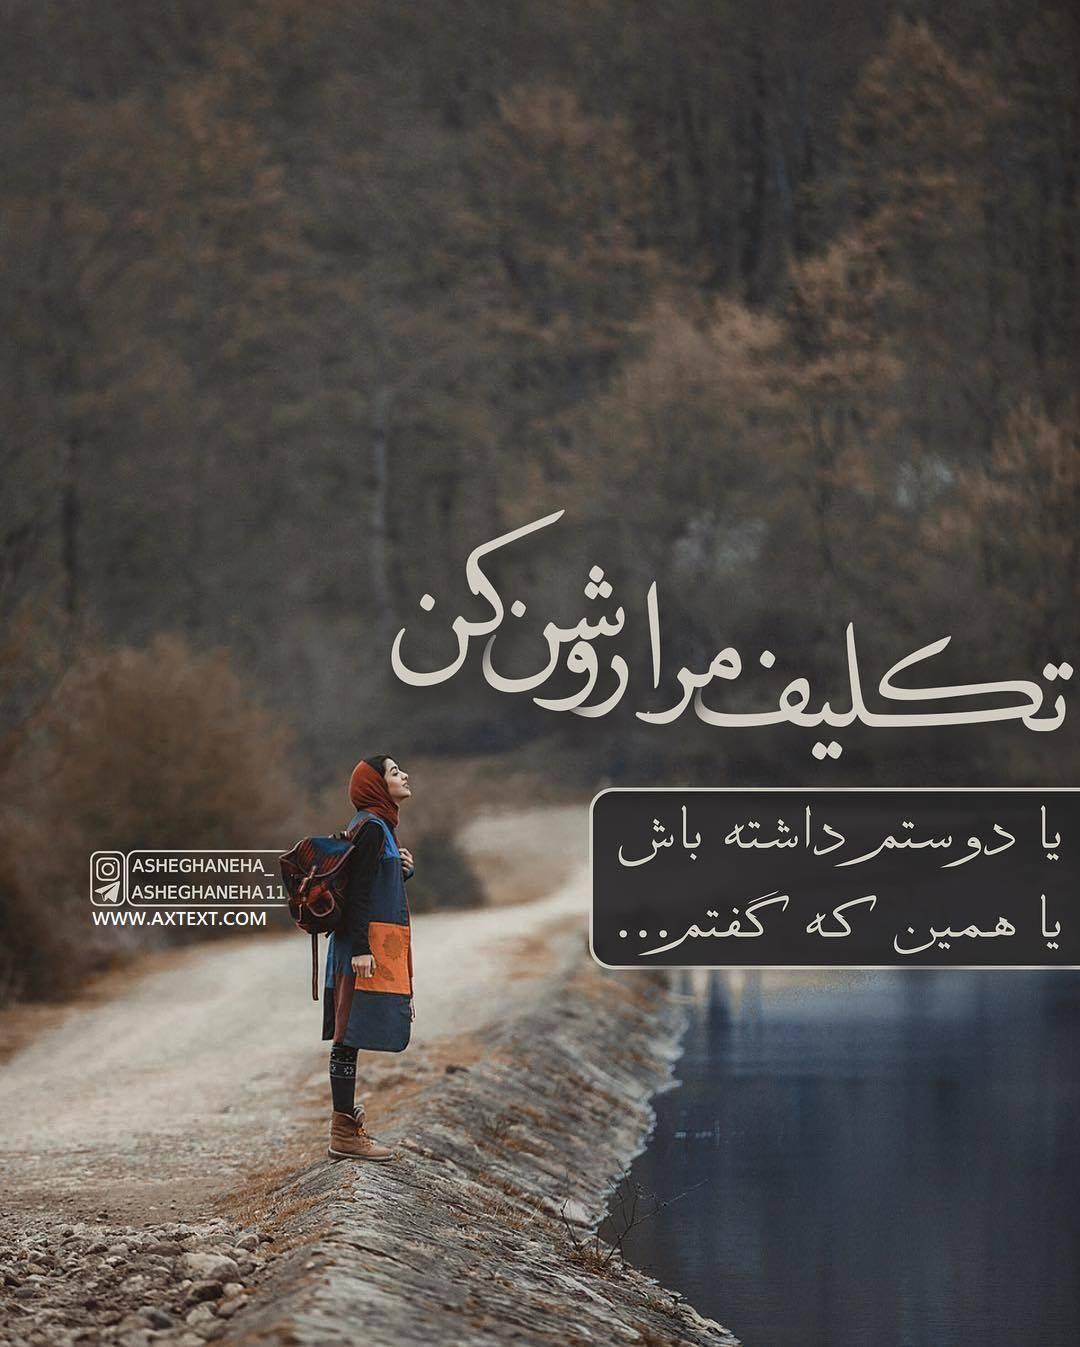 عکس نوشته تکلیف مرا روشن کن